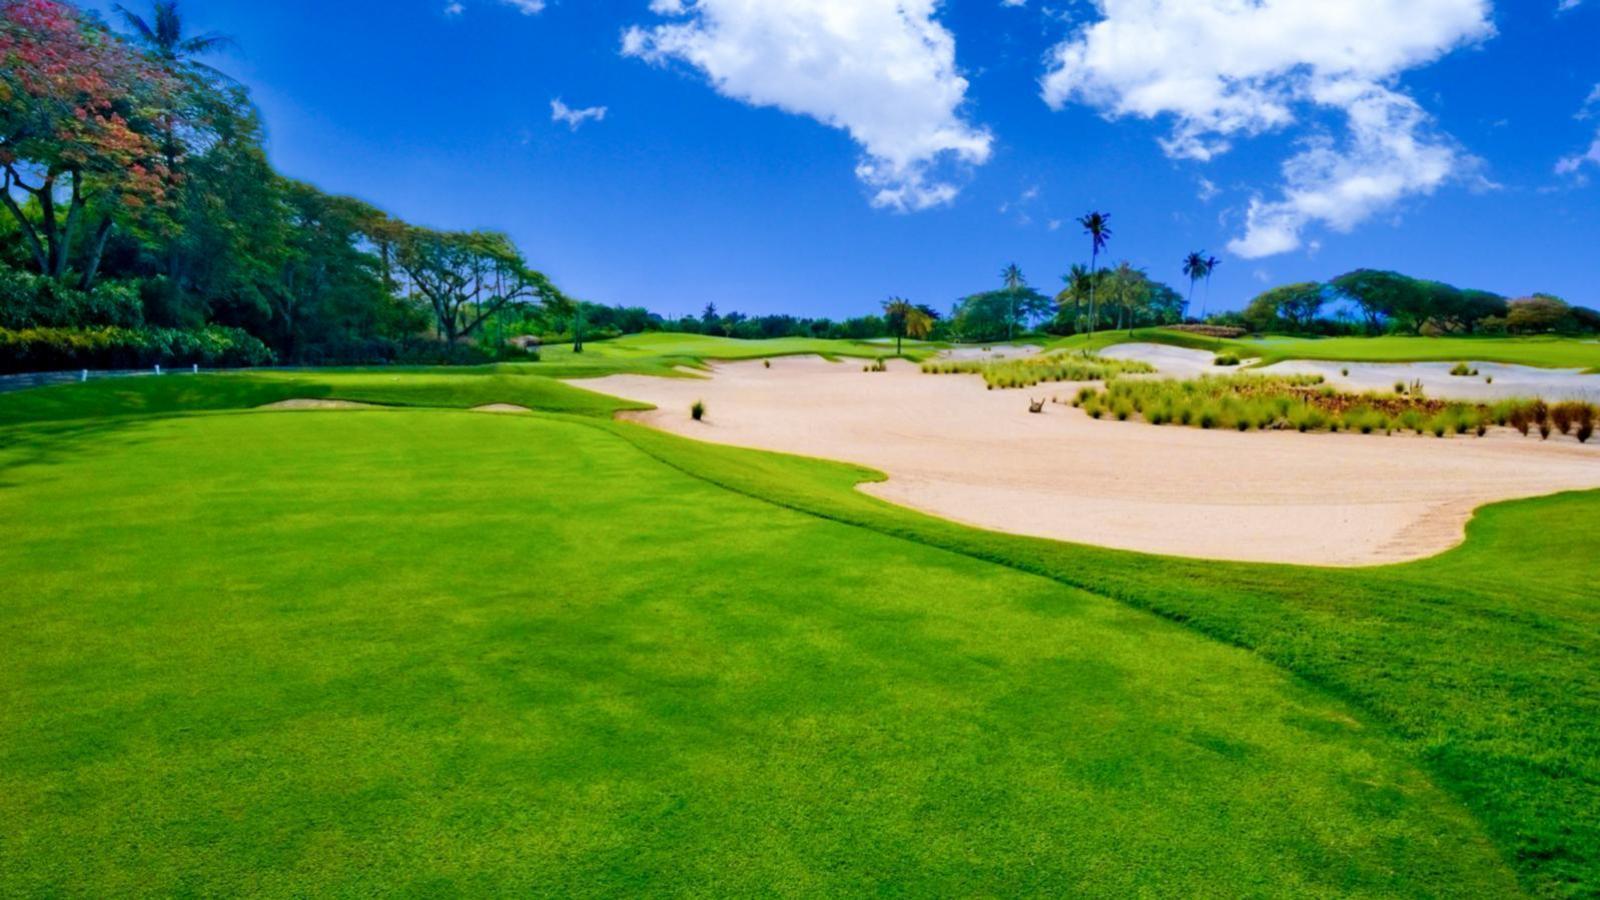 Bali National Golf Course - Bali Gates of Heaven